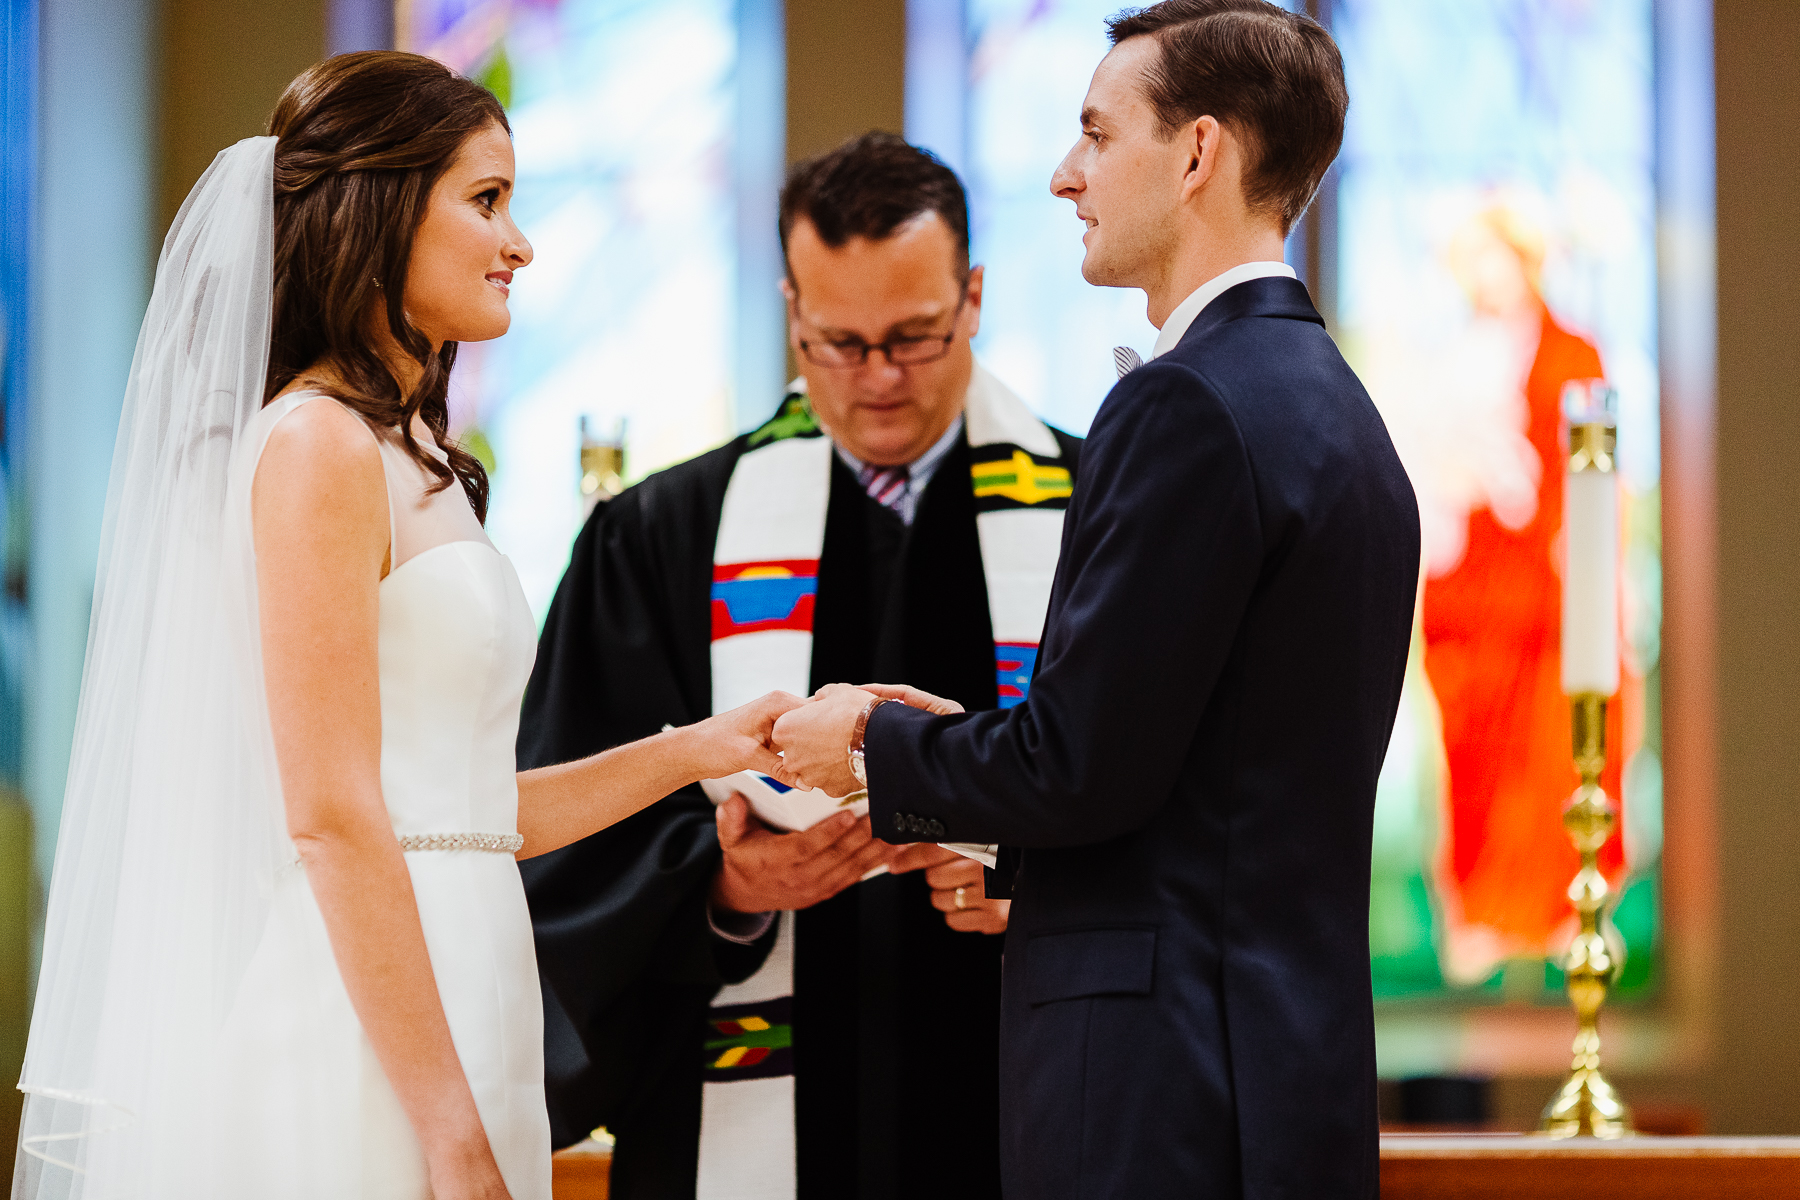 46-J Crew Wedding New Jersey Wedding Photographer J Crew Weddings.jpg